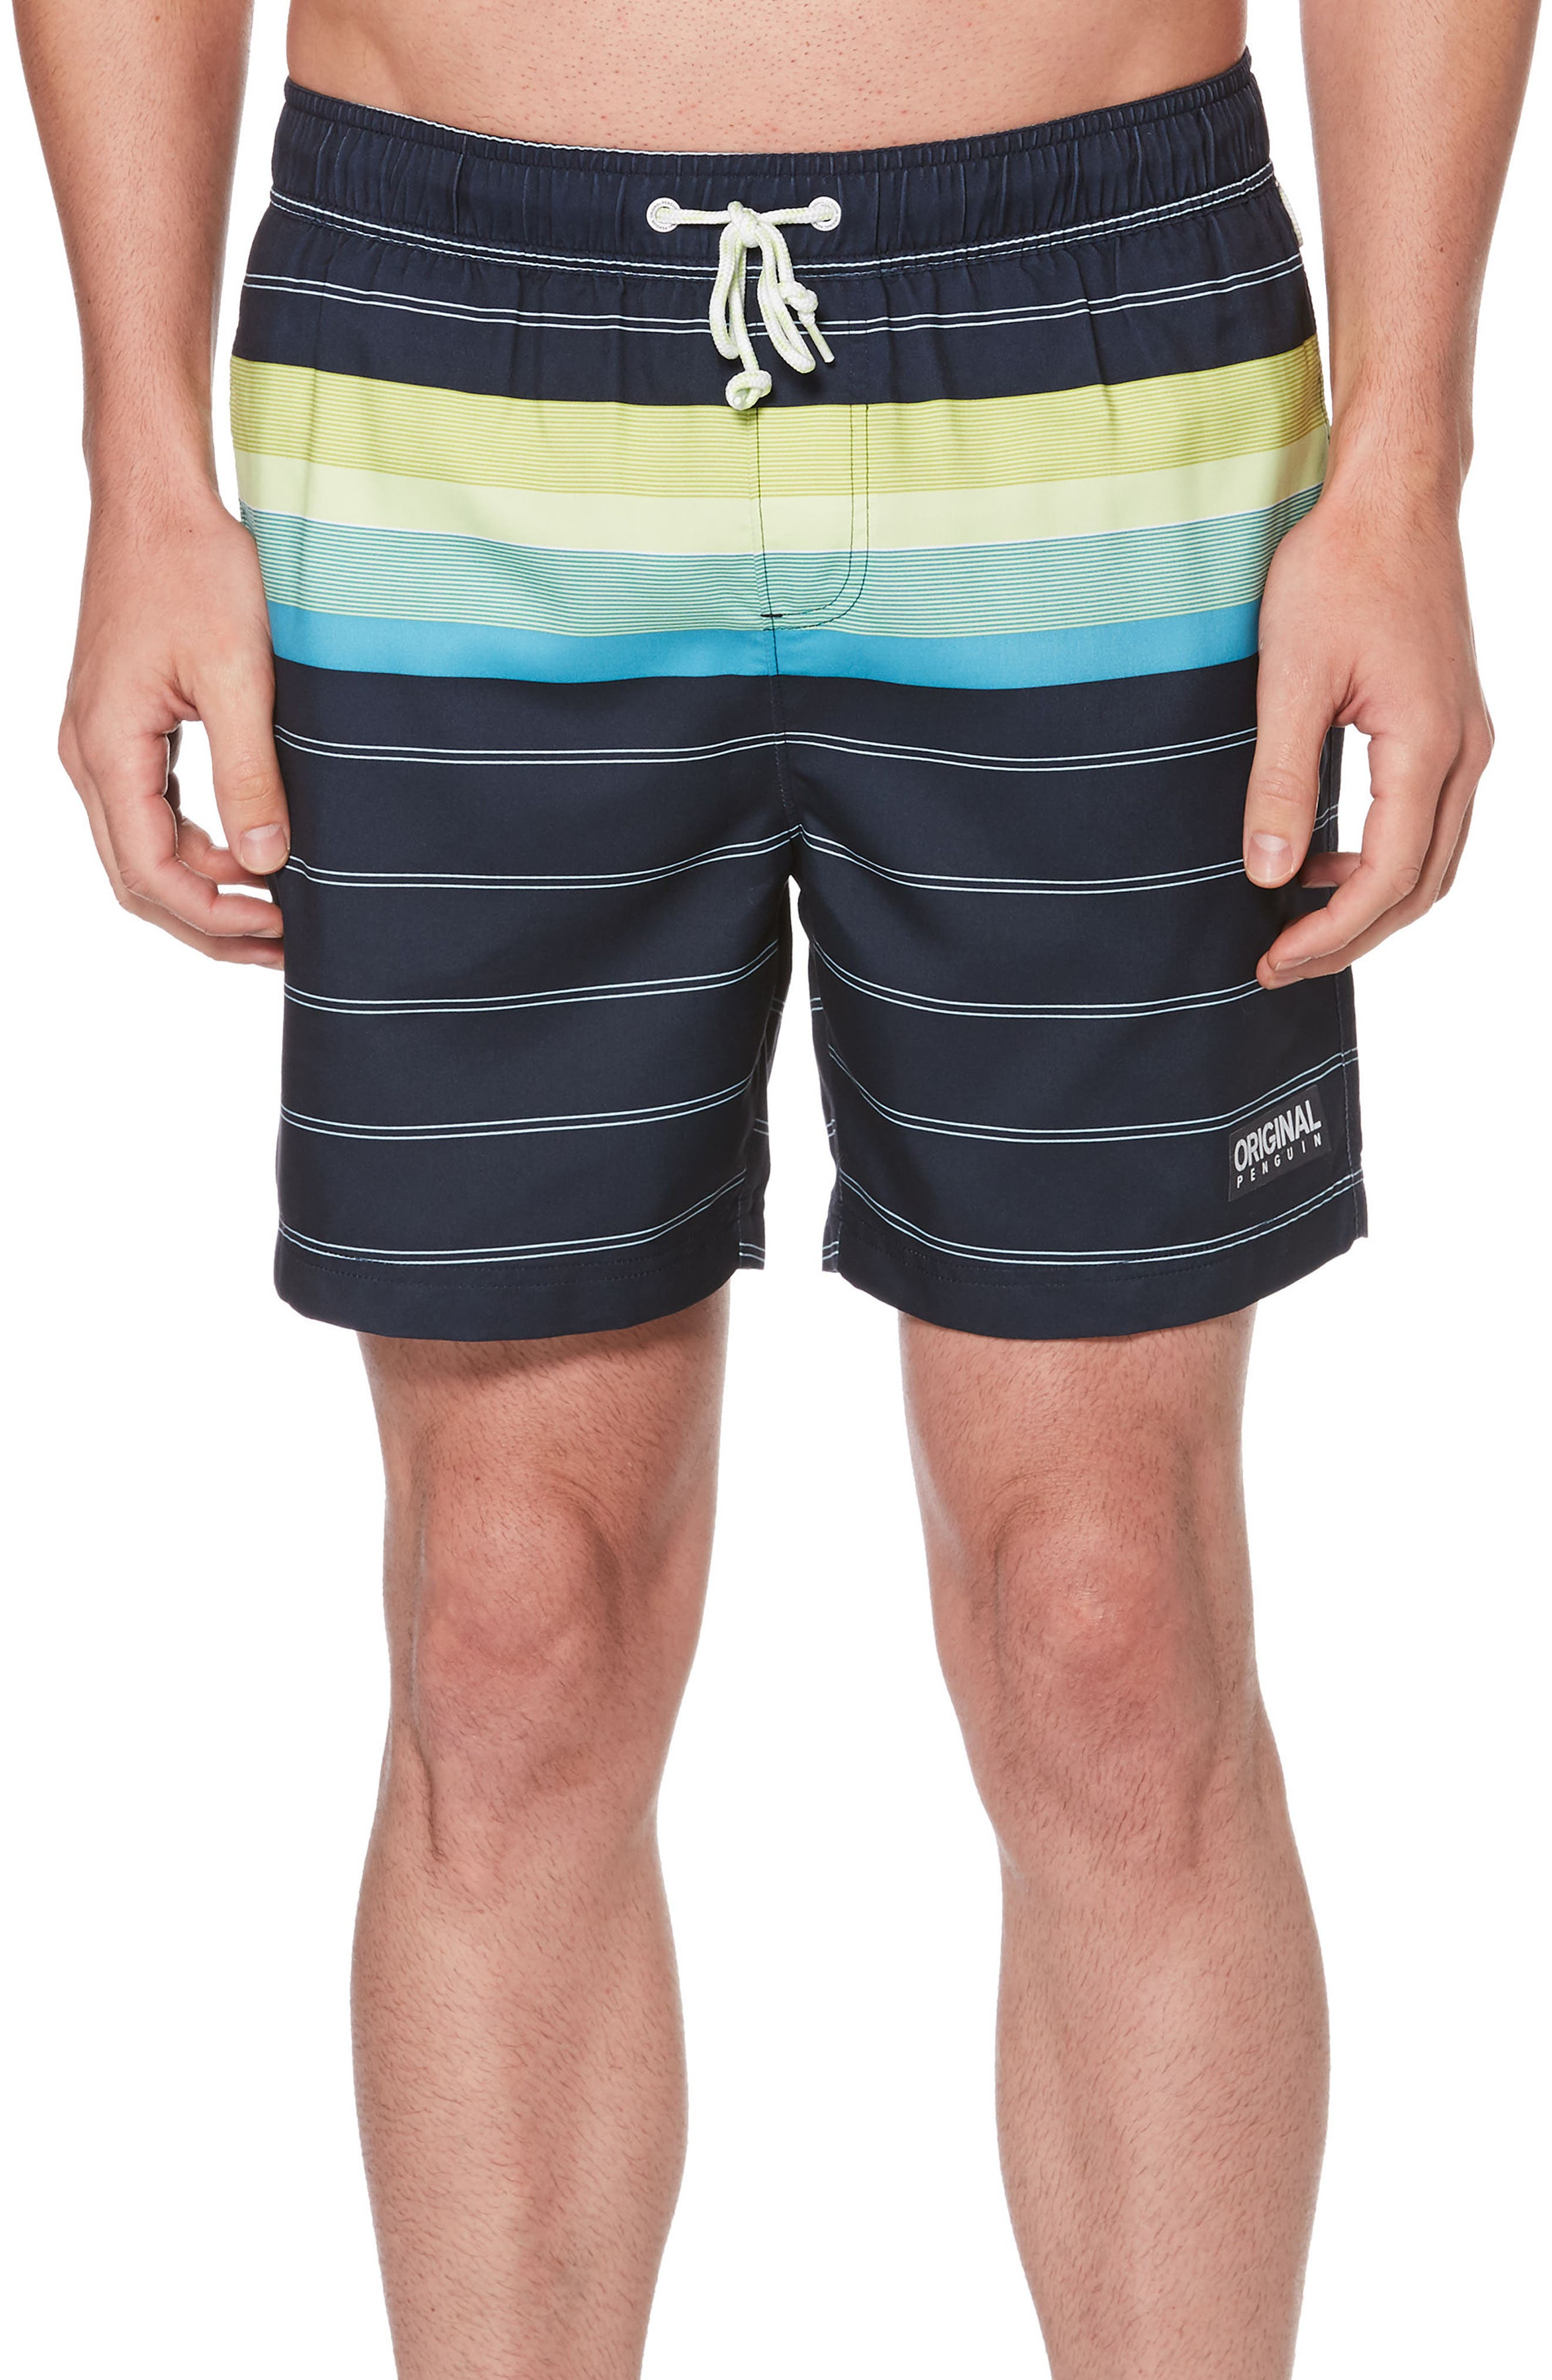 Engineered Stripe Swim Trunks,                         Main,                         color, 413